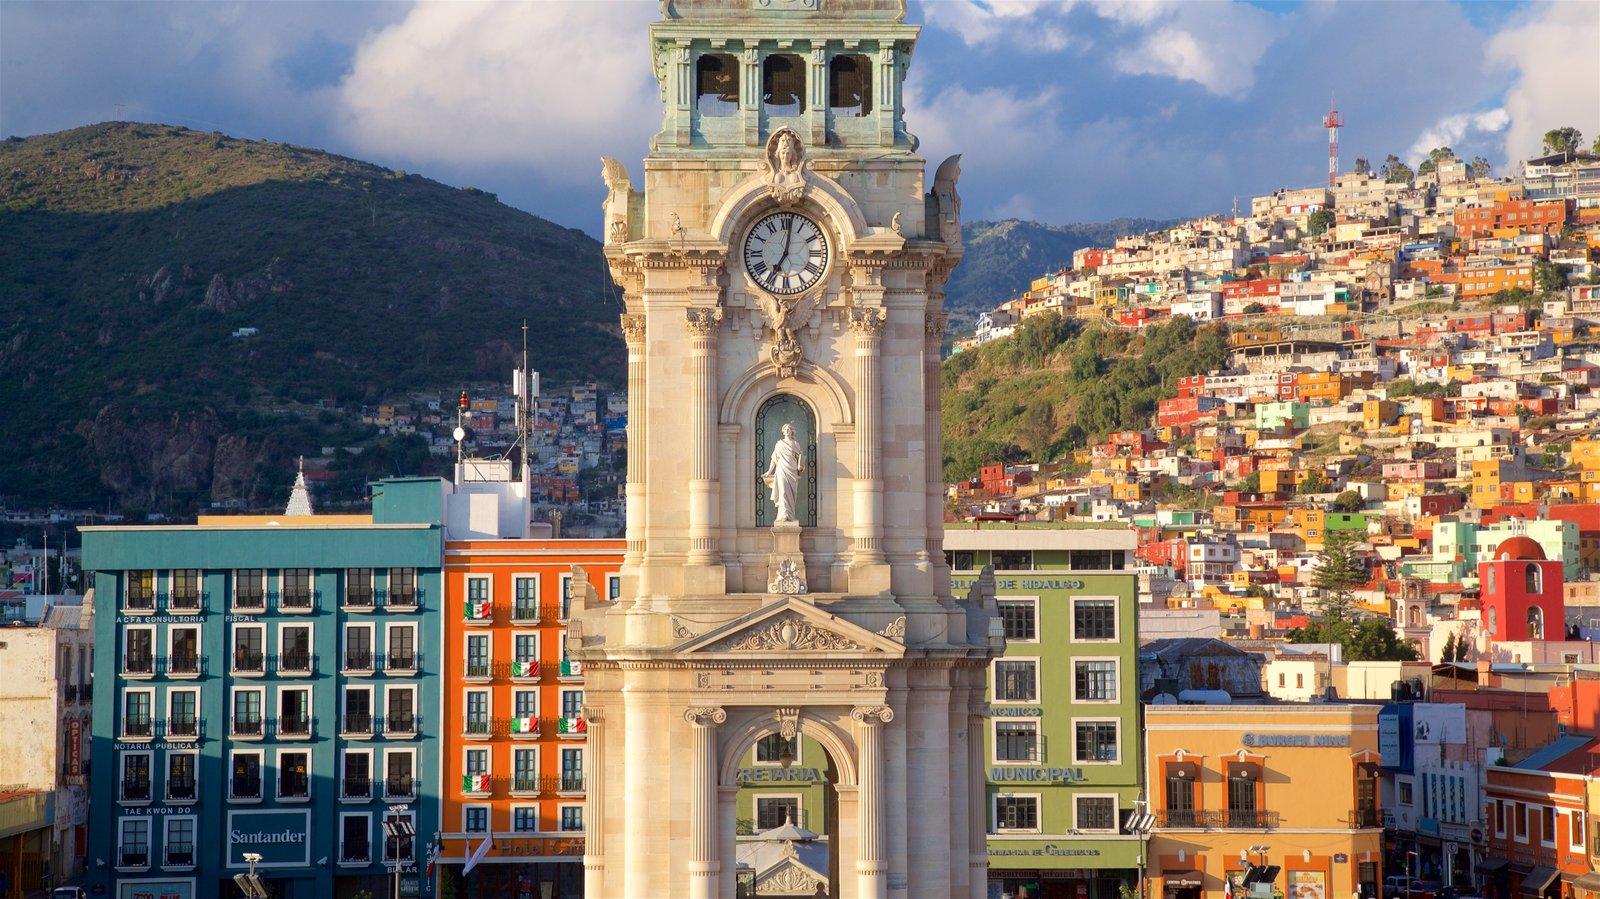 Vista del Reloj Monumental de Pachuca